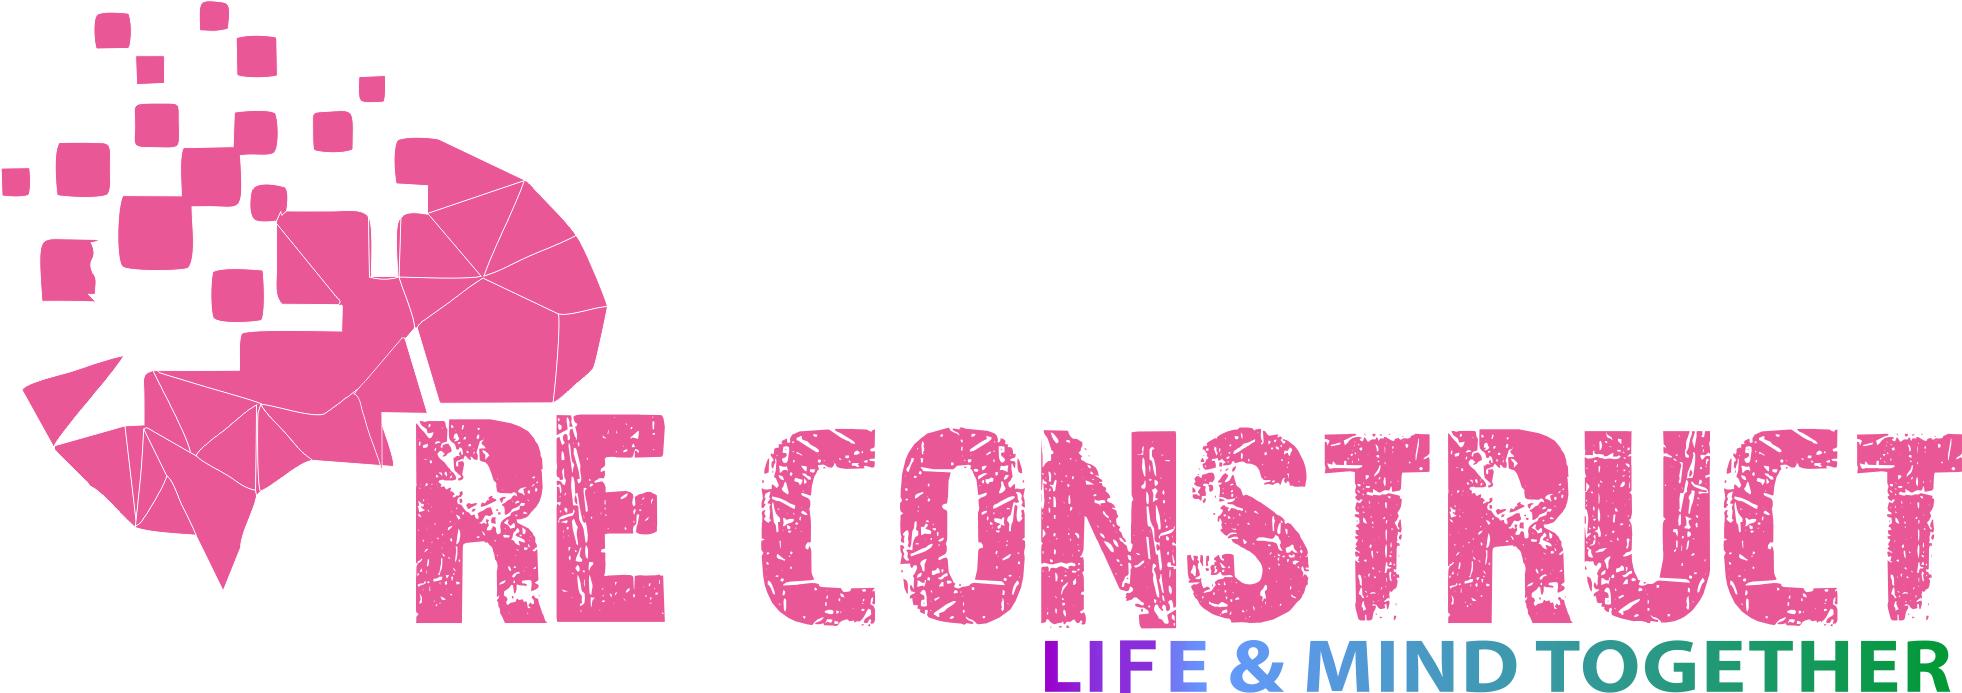 reconstruct.logo1__0.png